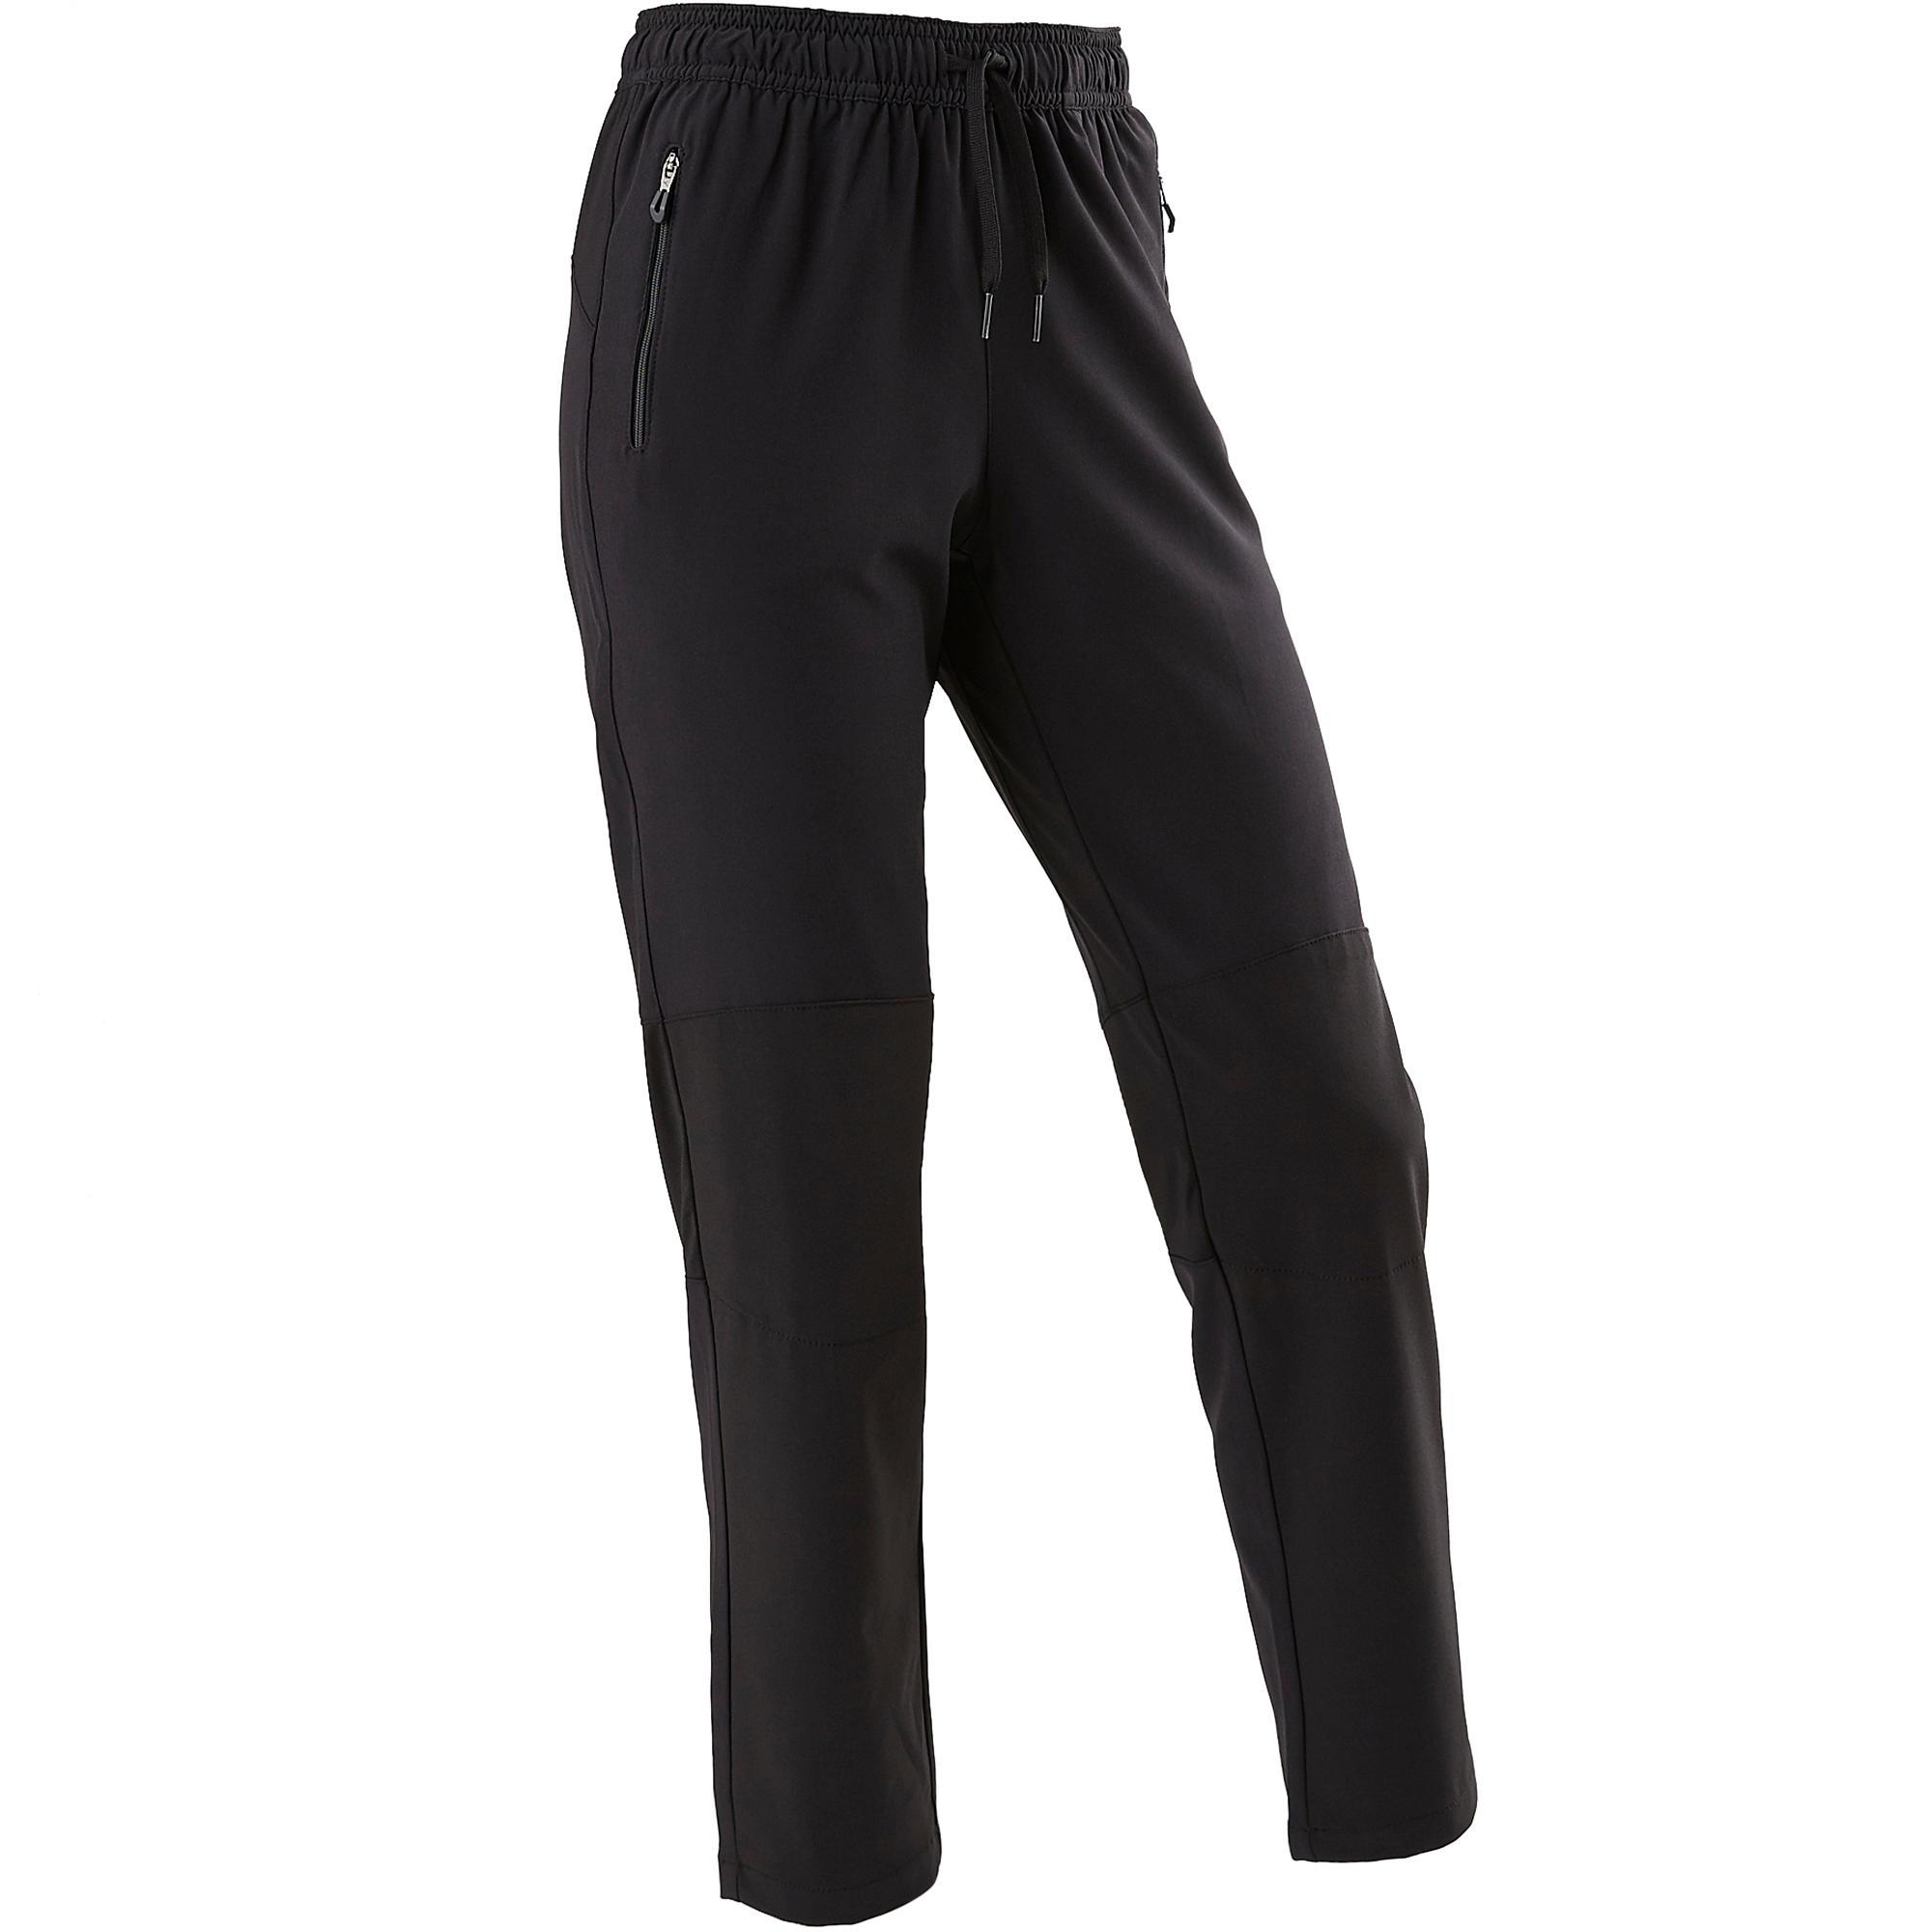 Pantalon ușor W900 băieți